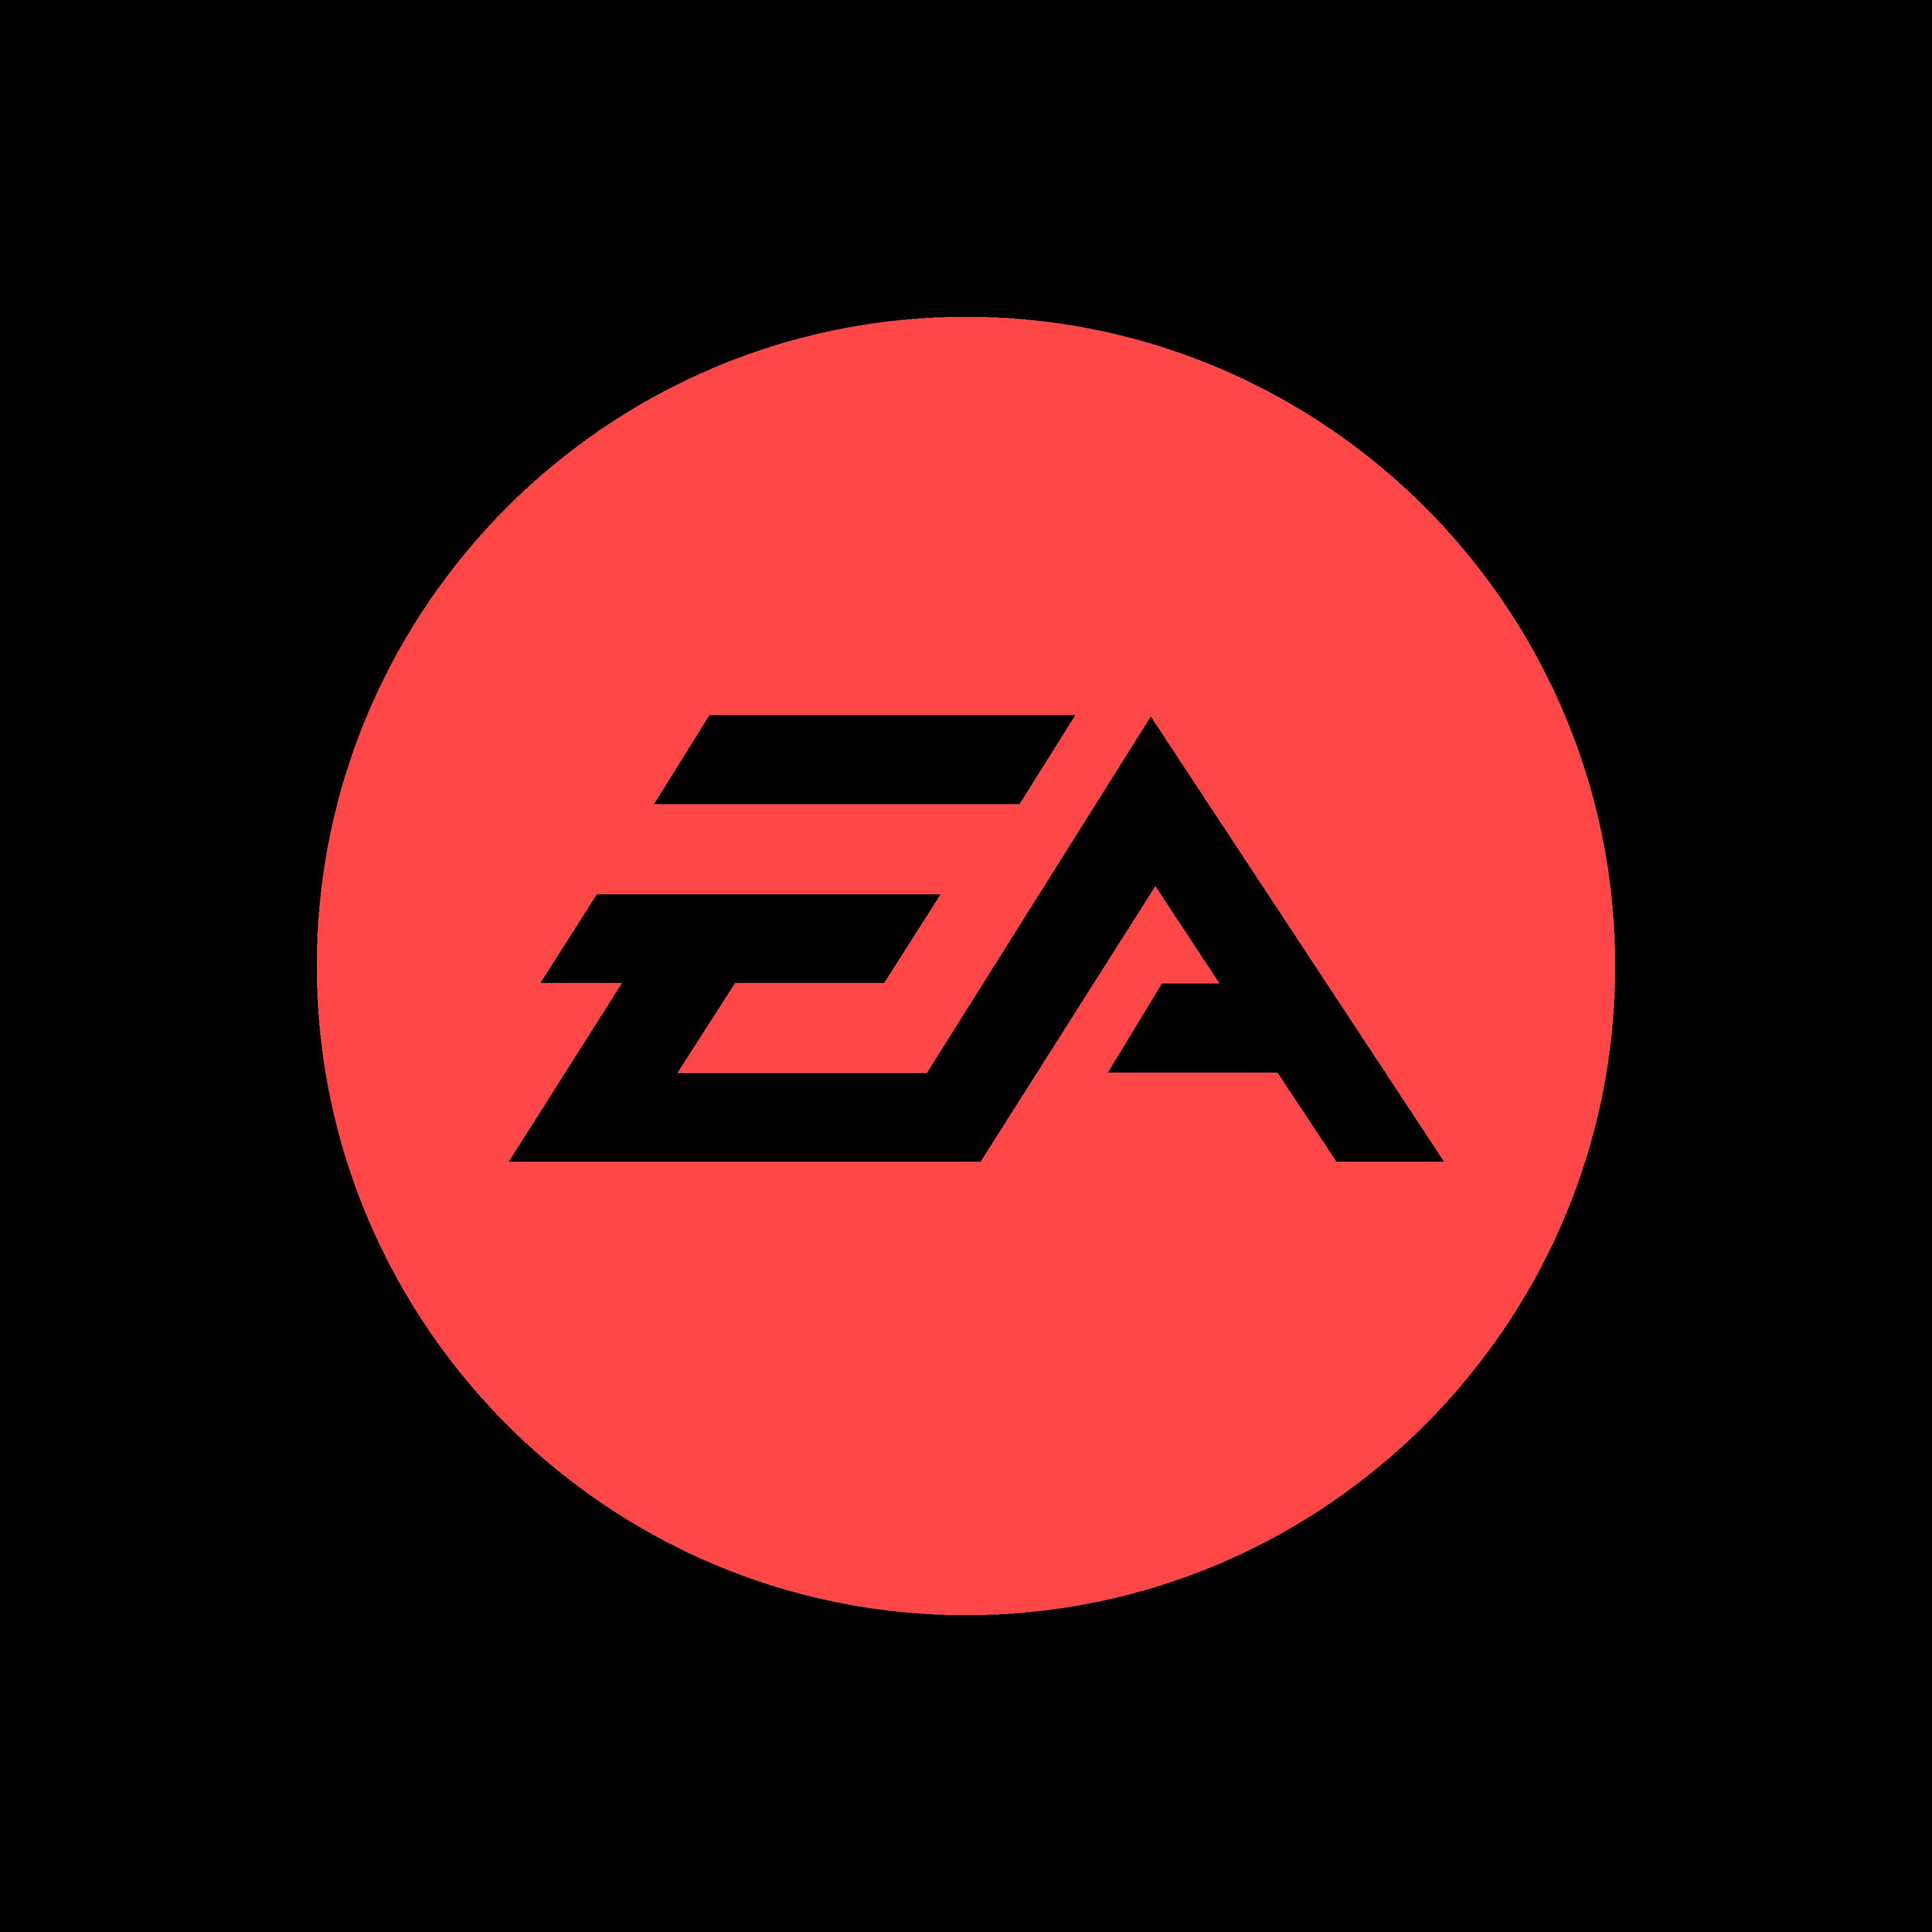 electronic arts logo 0 - Electronic Arts Logo